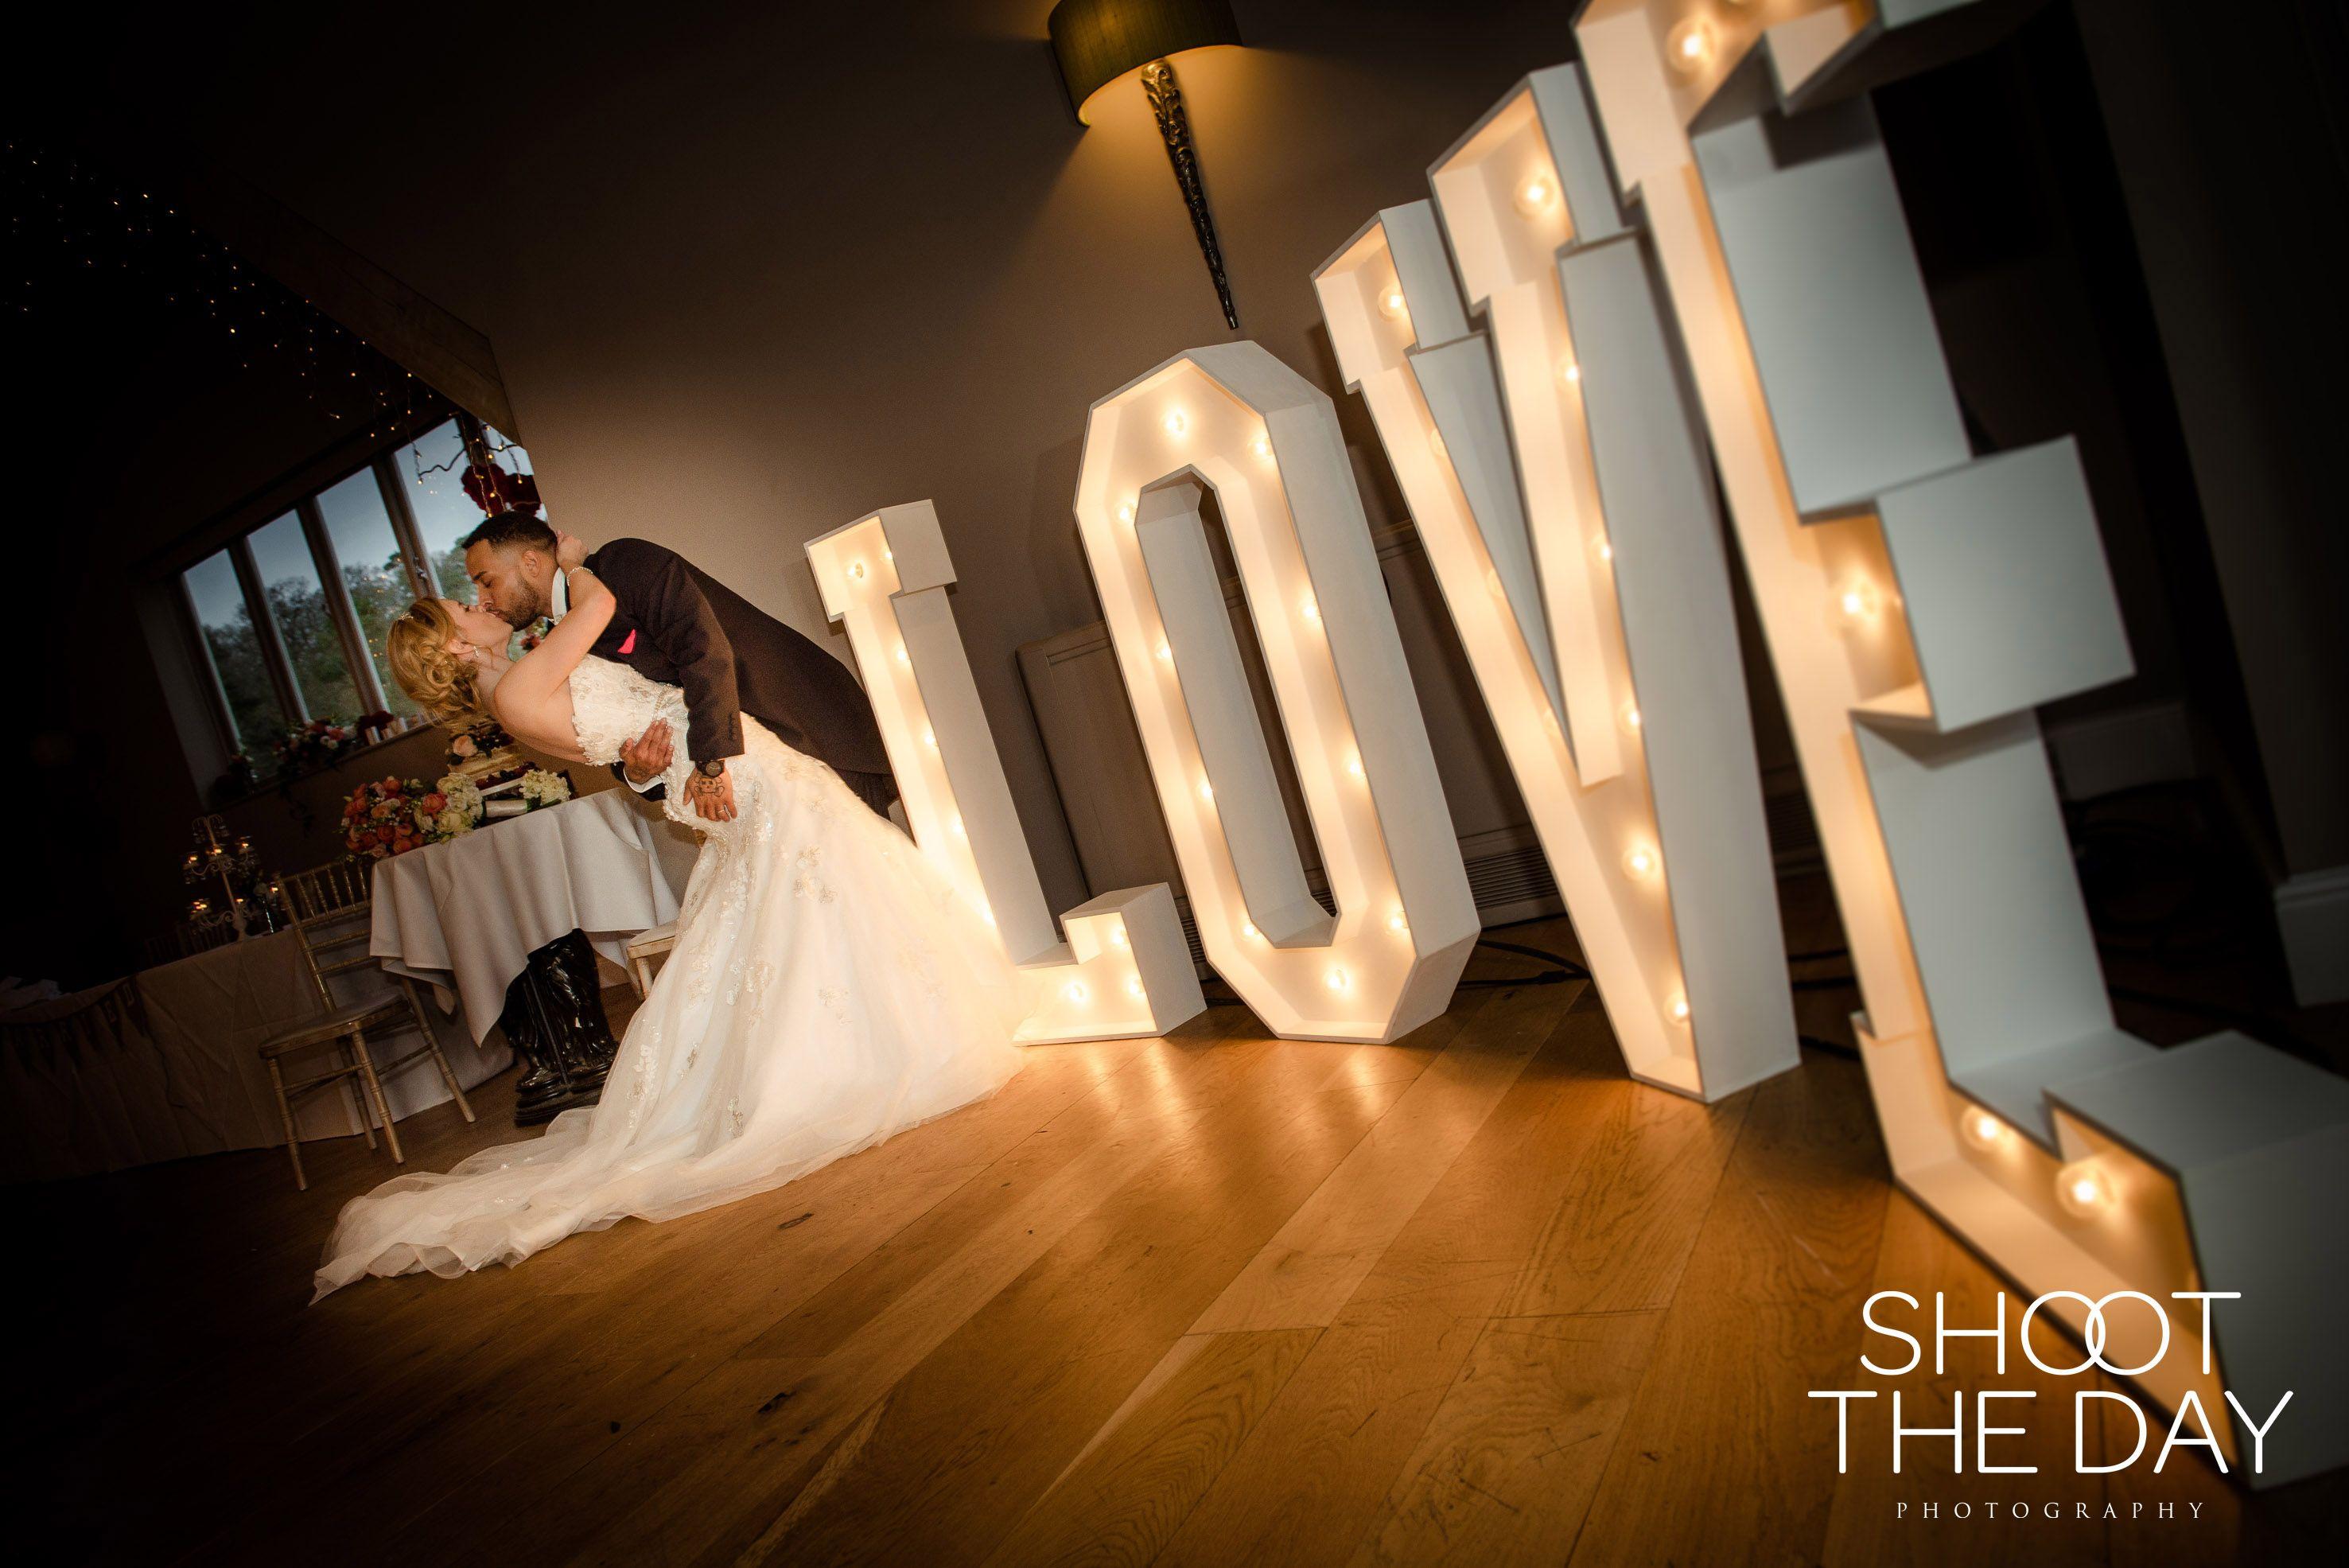 Illuminated Love Letter Lights Make For A Stunning Backdrop